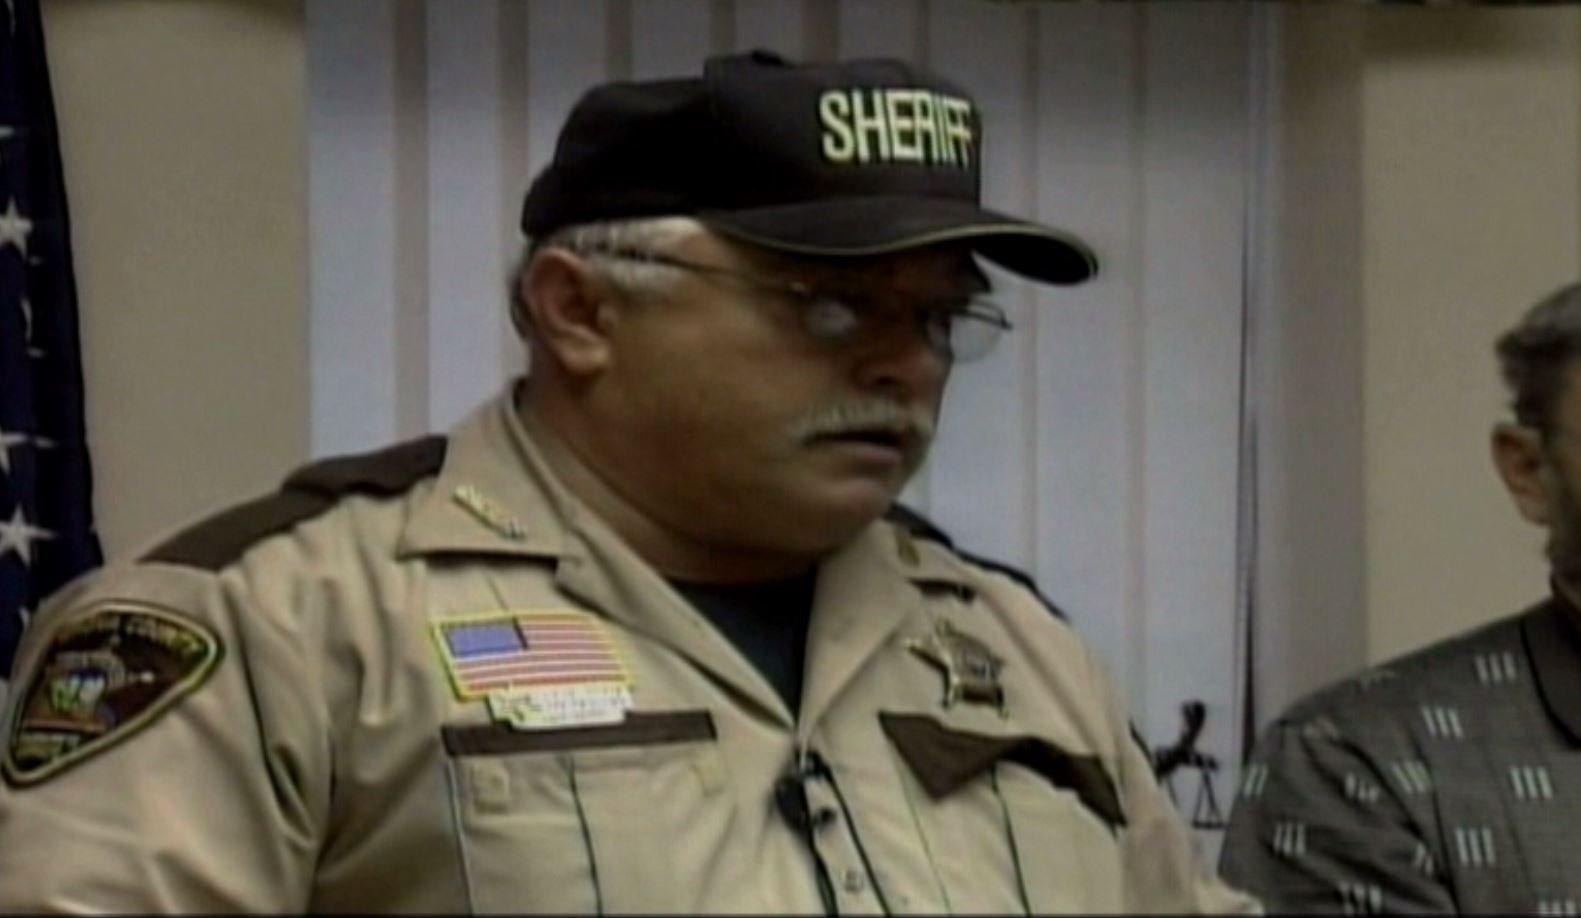 Winona County Sheriff Dave Brand in 2007